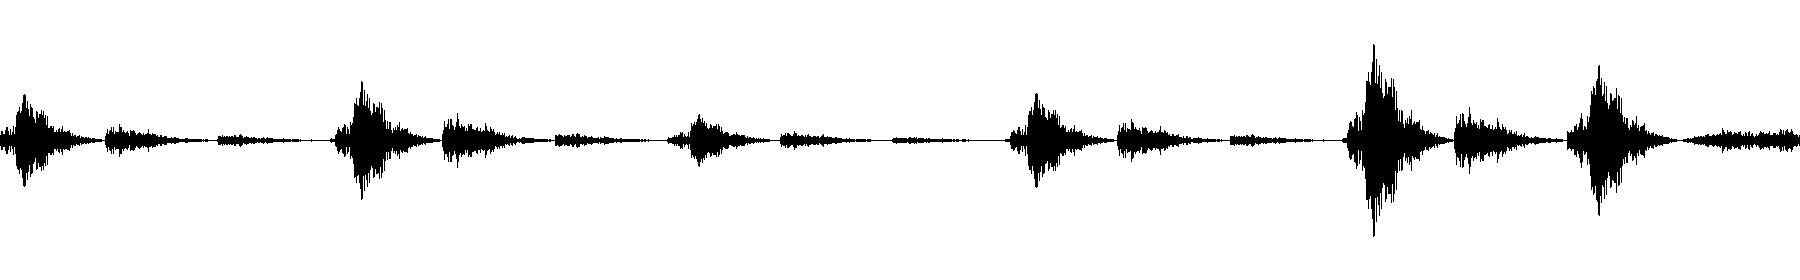 shaker sample oneshot